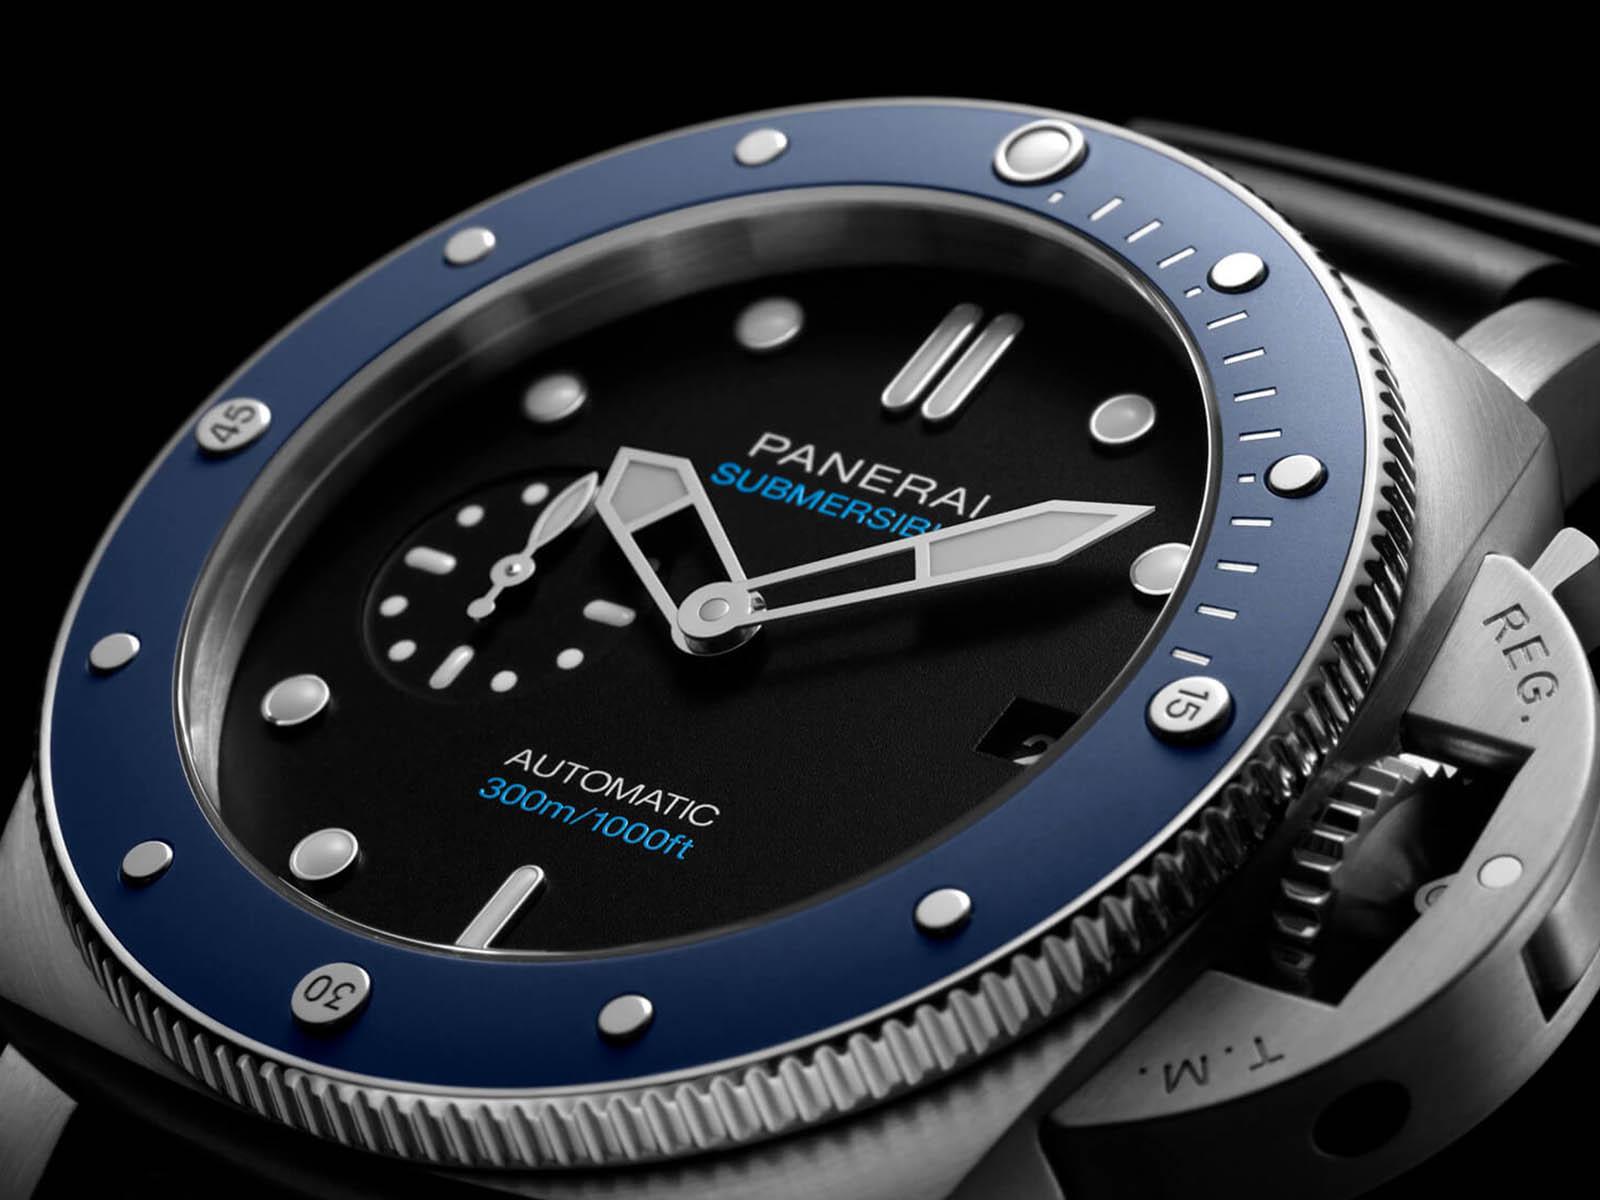 pam01209-panerai-submersible-azzuro-42mm-limited-edition-3.jpg